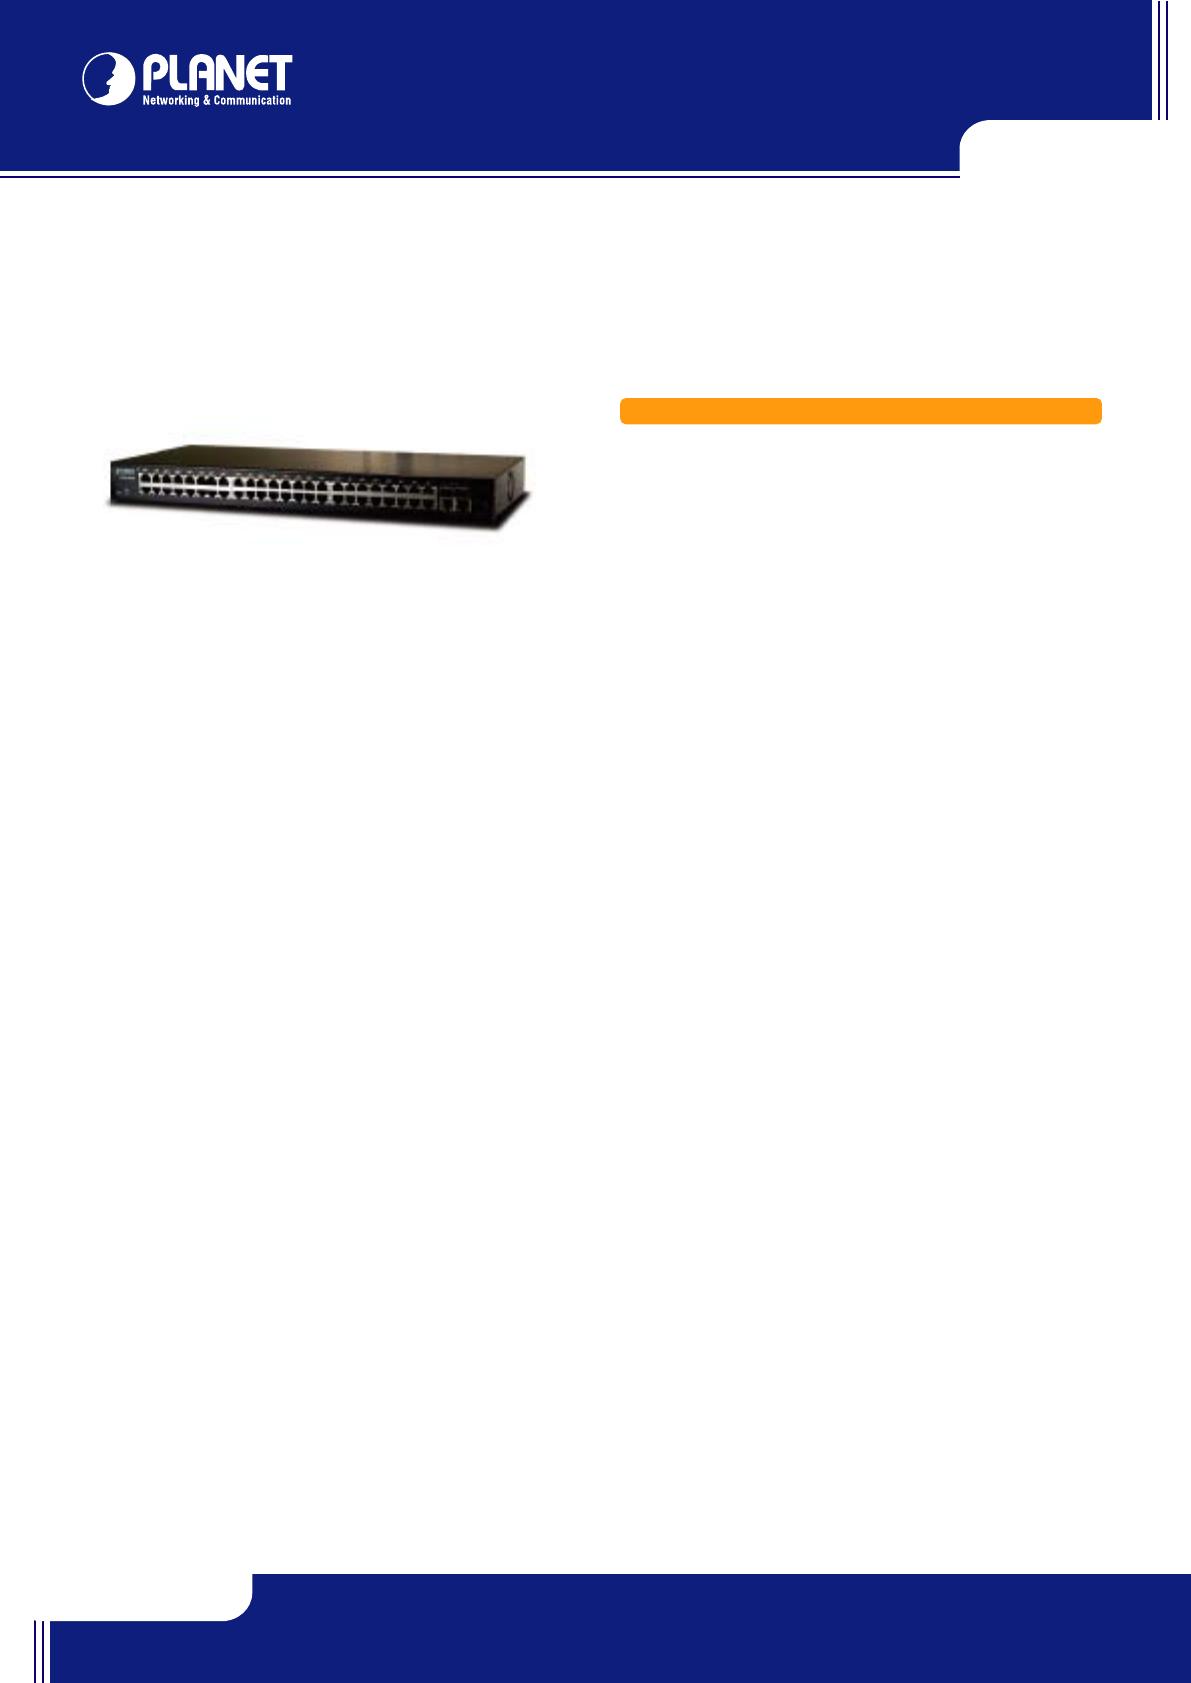 fgsw-4840s firmware